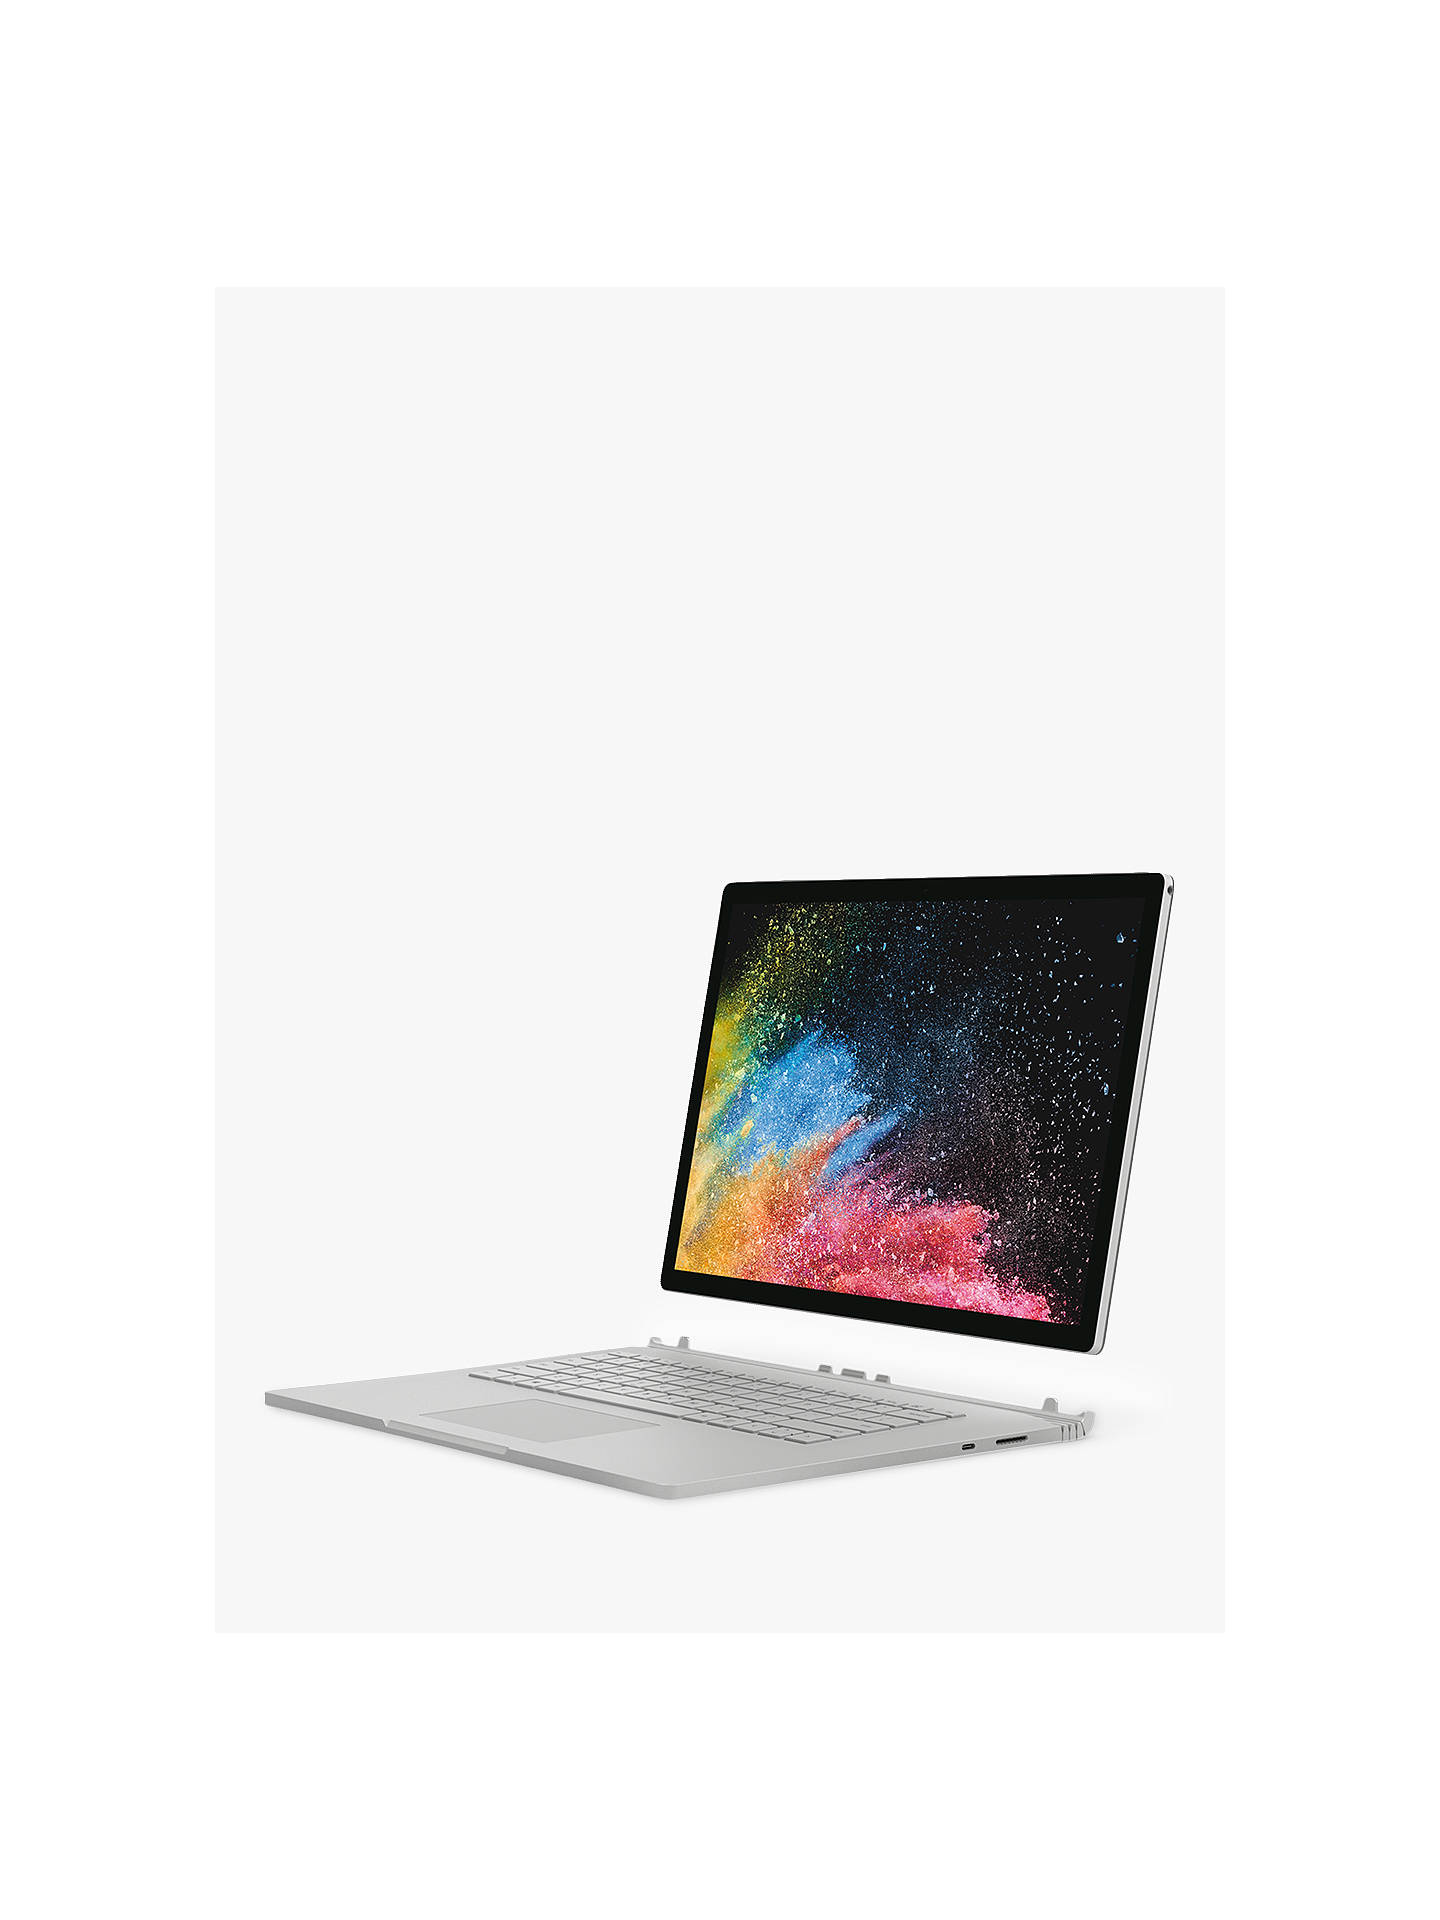 "Microsoft Surface Book 2, Intel Core i7, 16GB RAM, 1TB SSD, 15"", PixelSense  Display, GeForce GTX 1060, Silver"